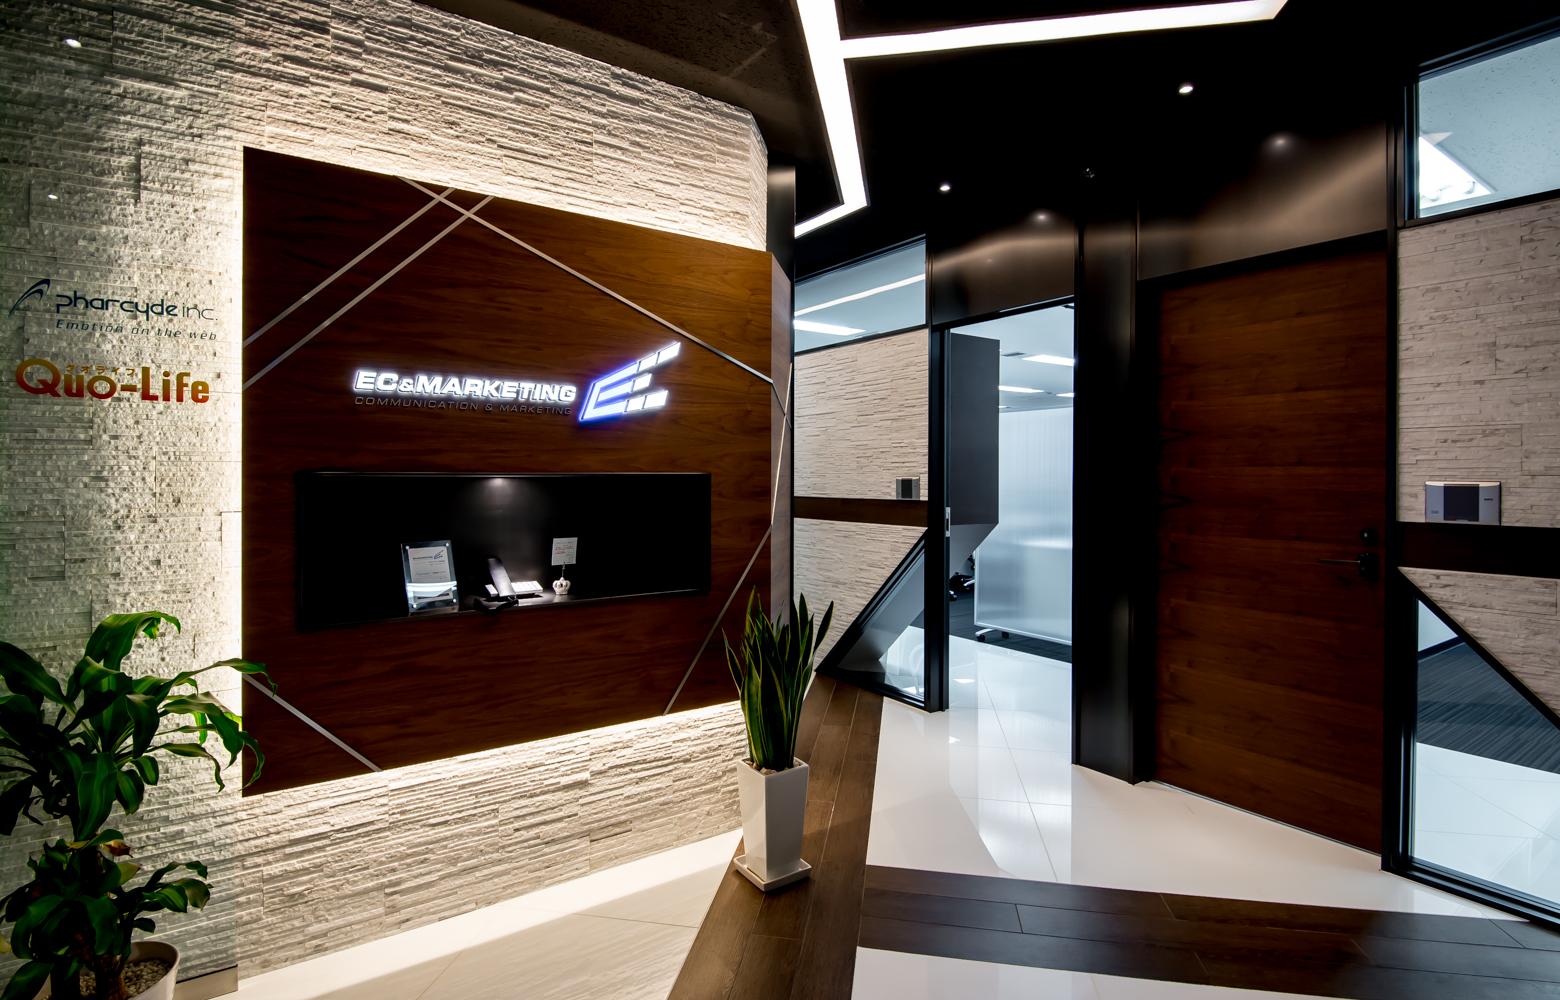 ECマーケティング株式会社 Entrance デザイン・レイアウト事例